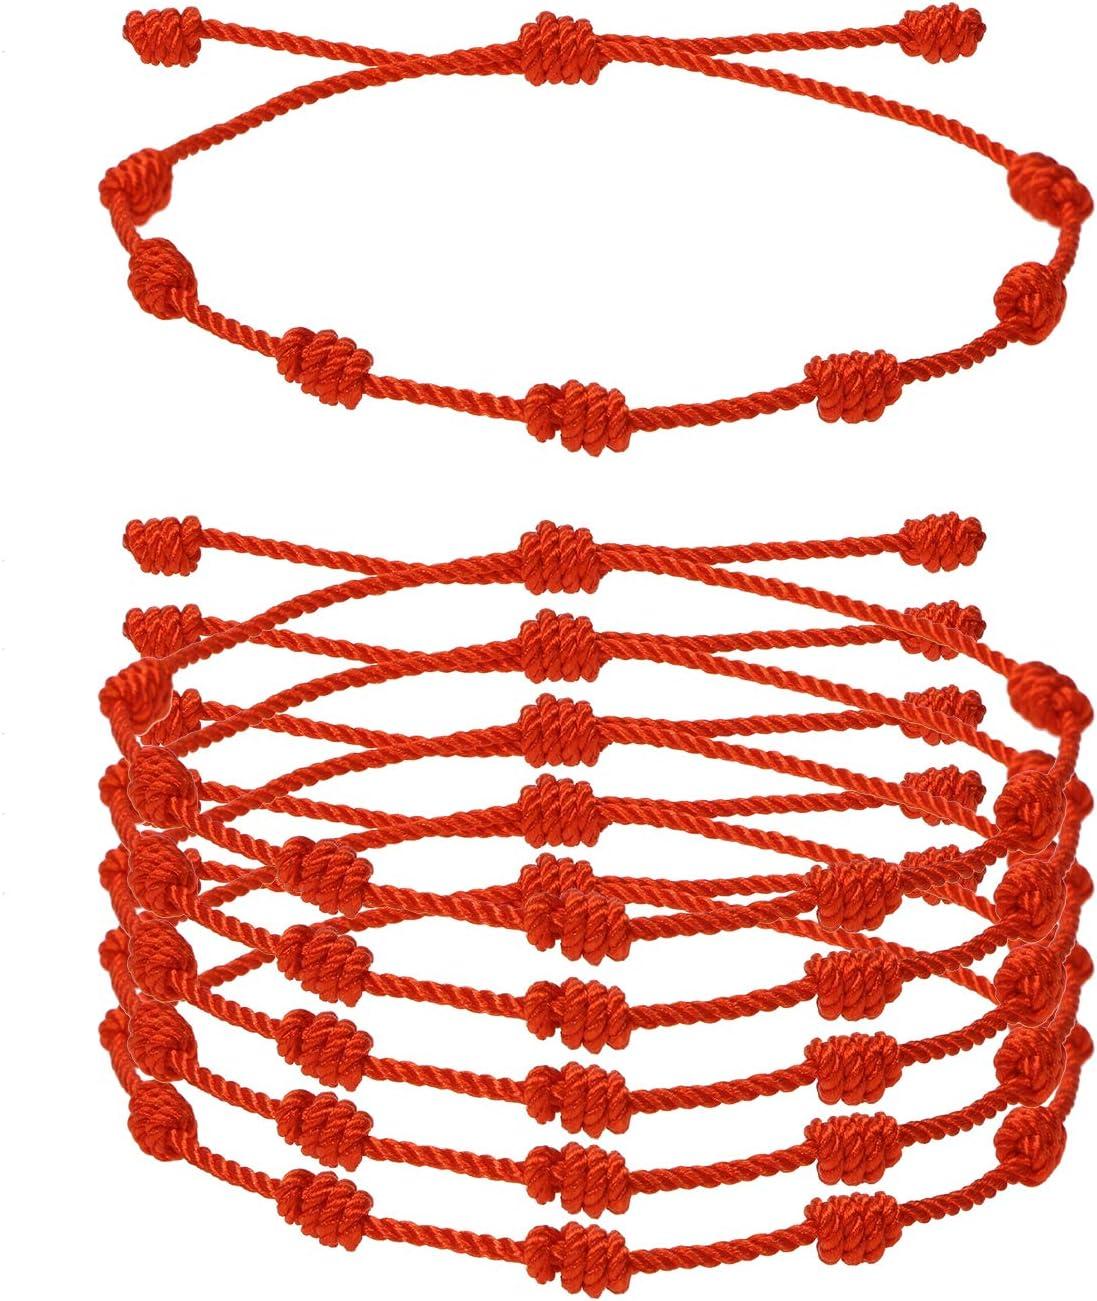 7 Knot Red String Bracelet Penta Angel 6Pcs Adjustable Good Luck Kabbalah Cord Bracelet Strap for Protection Success Friendship Graduation Birthday Lovers Gift for Men Women Girls Boys